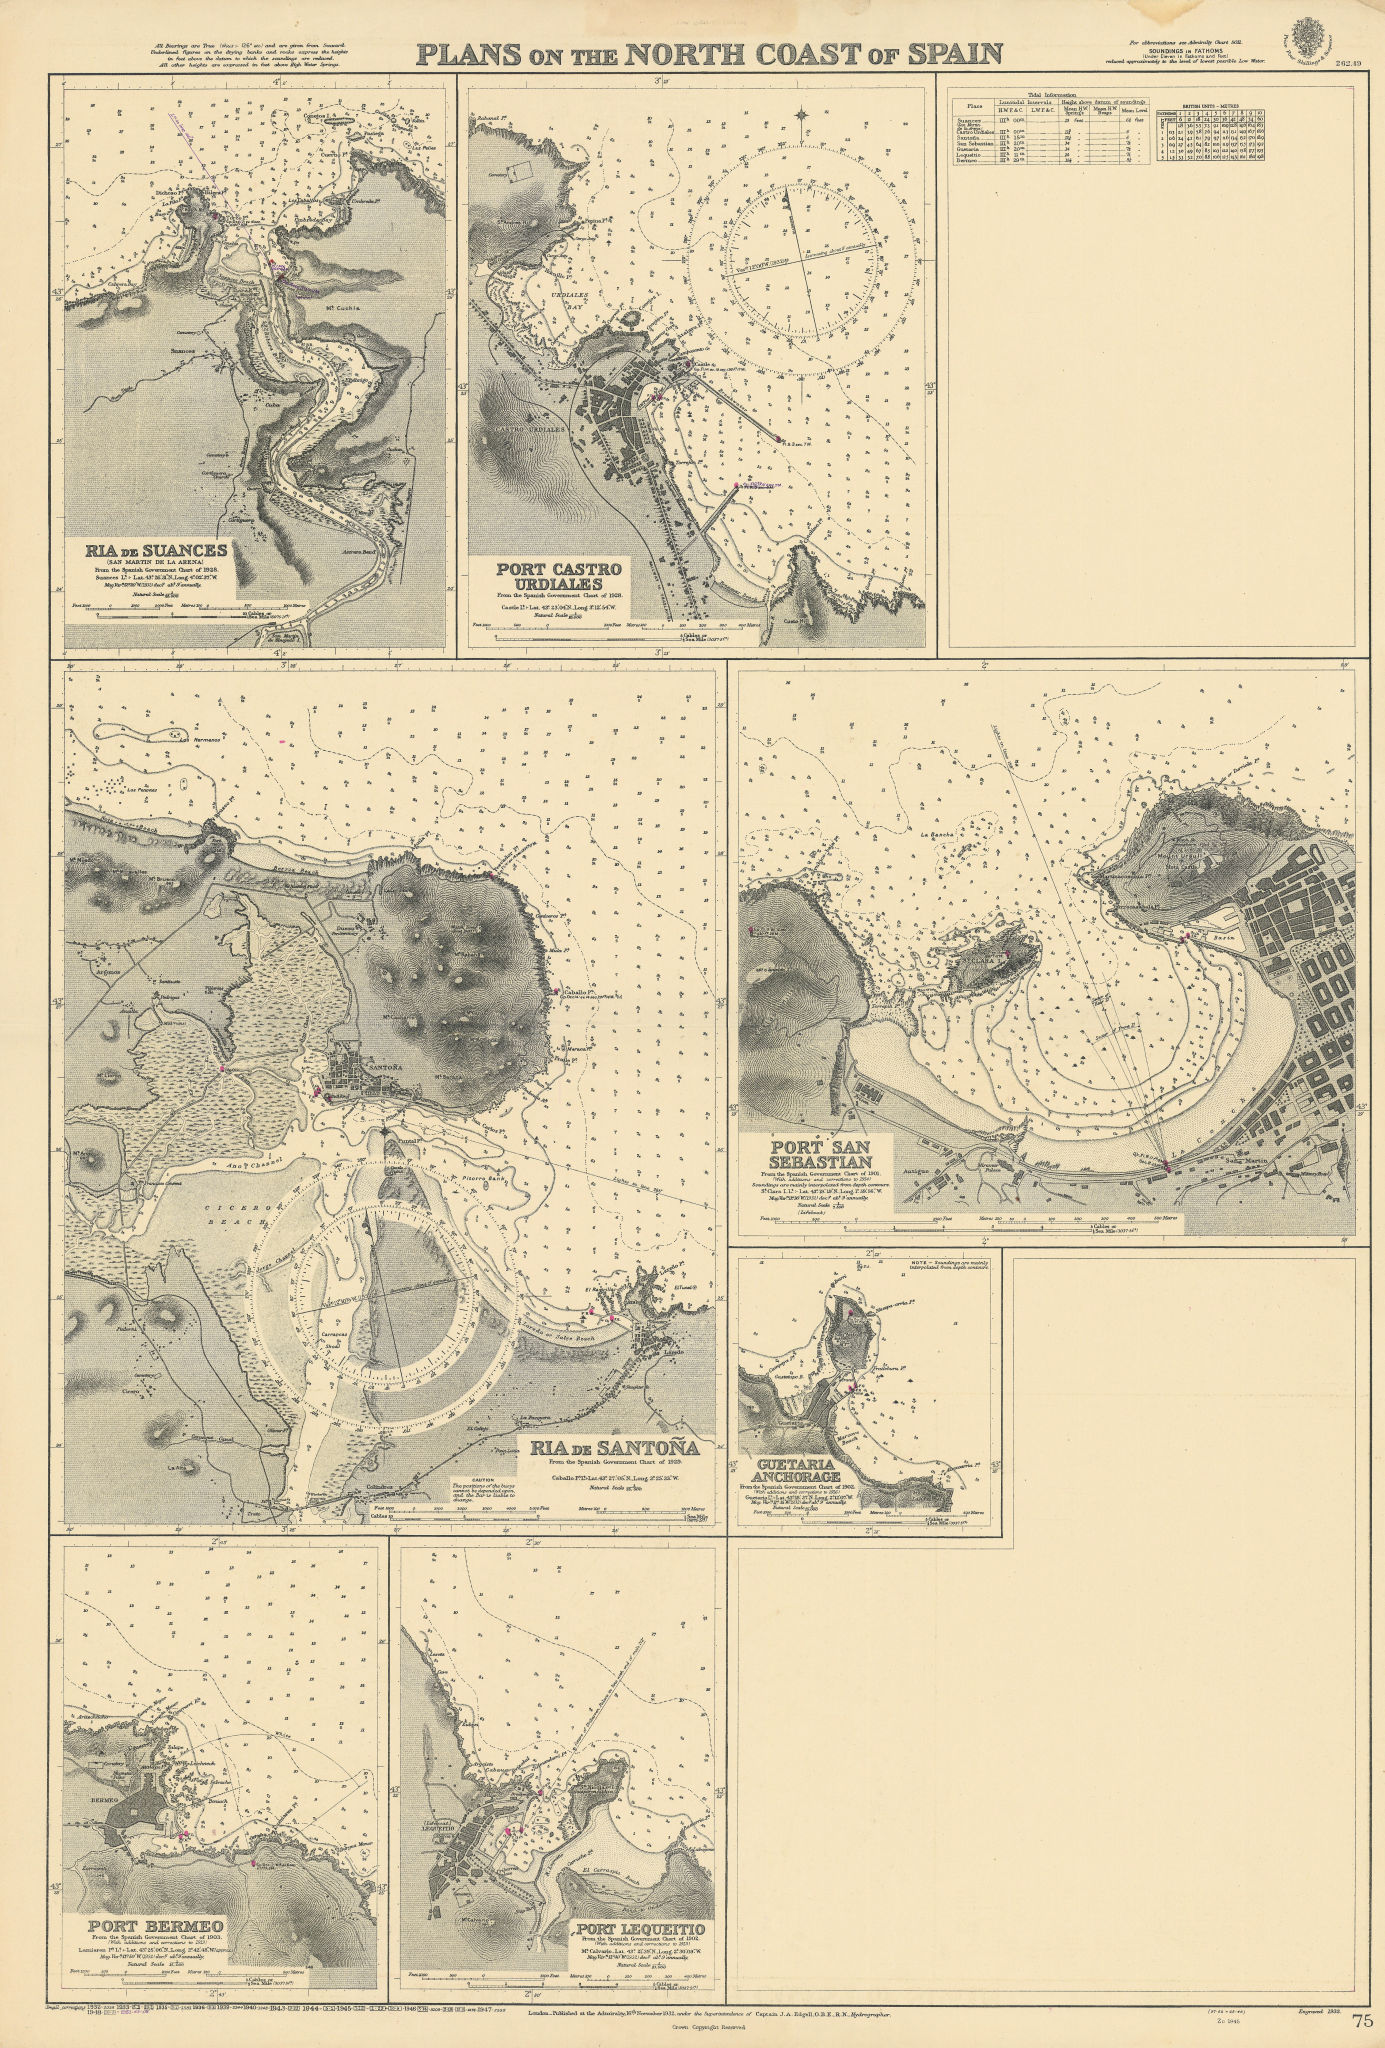 North Spain harbours. Santoña San Sebastian ADMIRALTY sea chart 1932 (1951) map